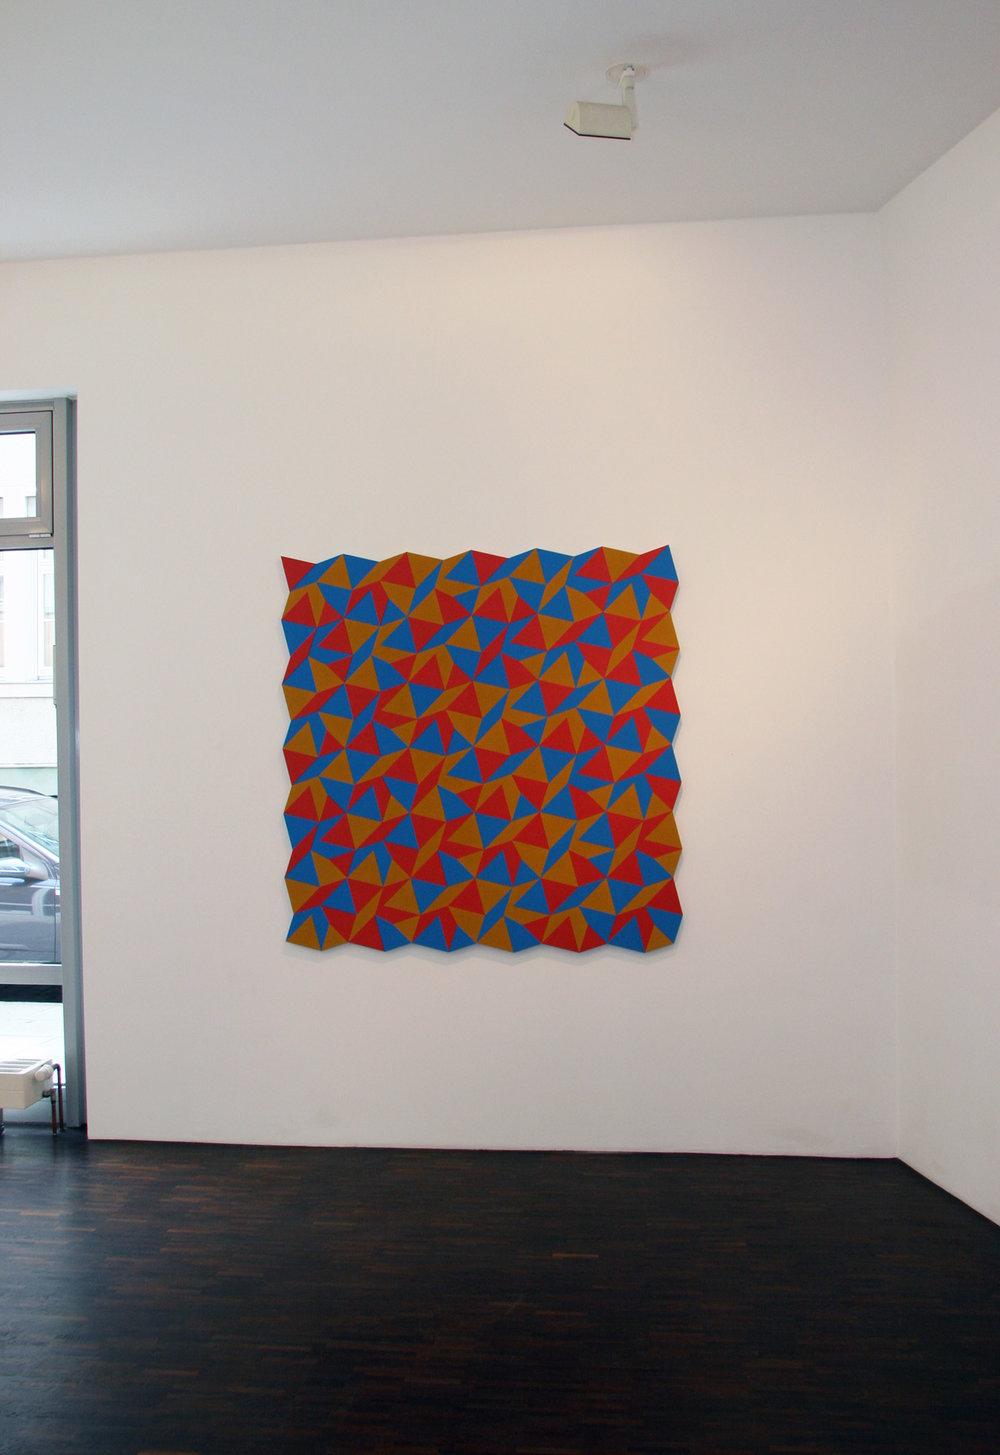 2007 Galerie Klaus Braun Text and Image 3.jpg